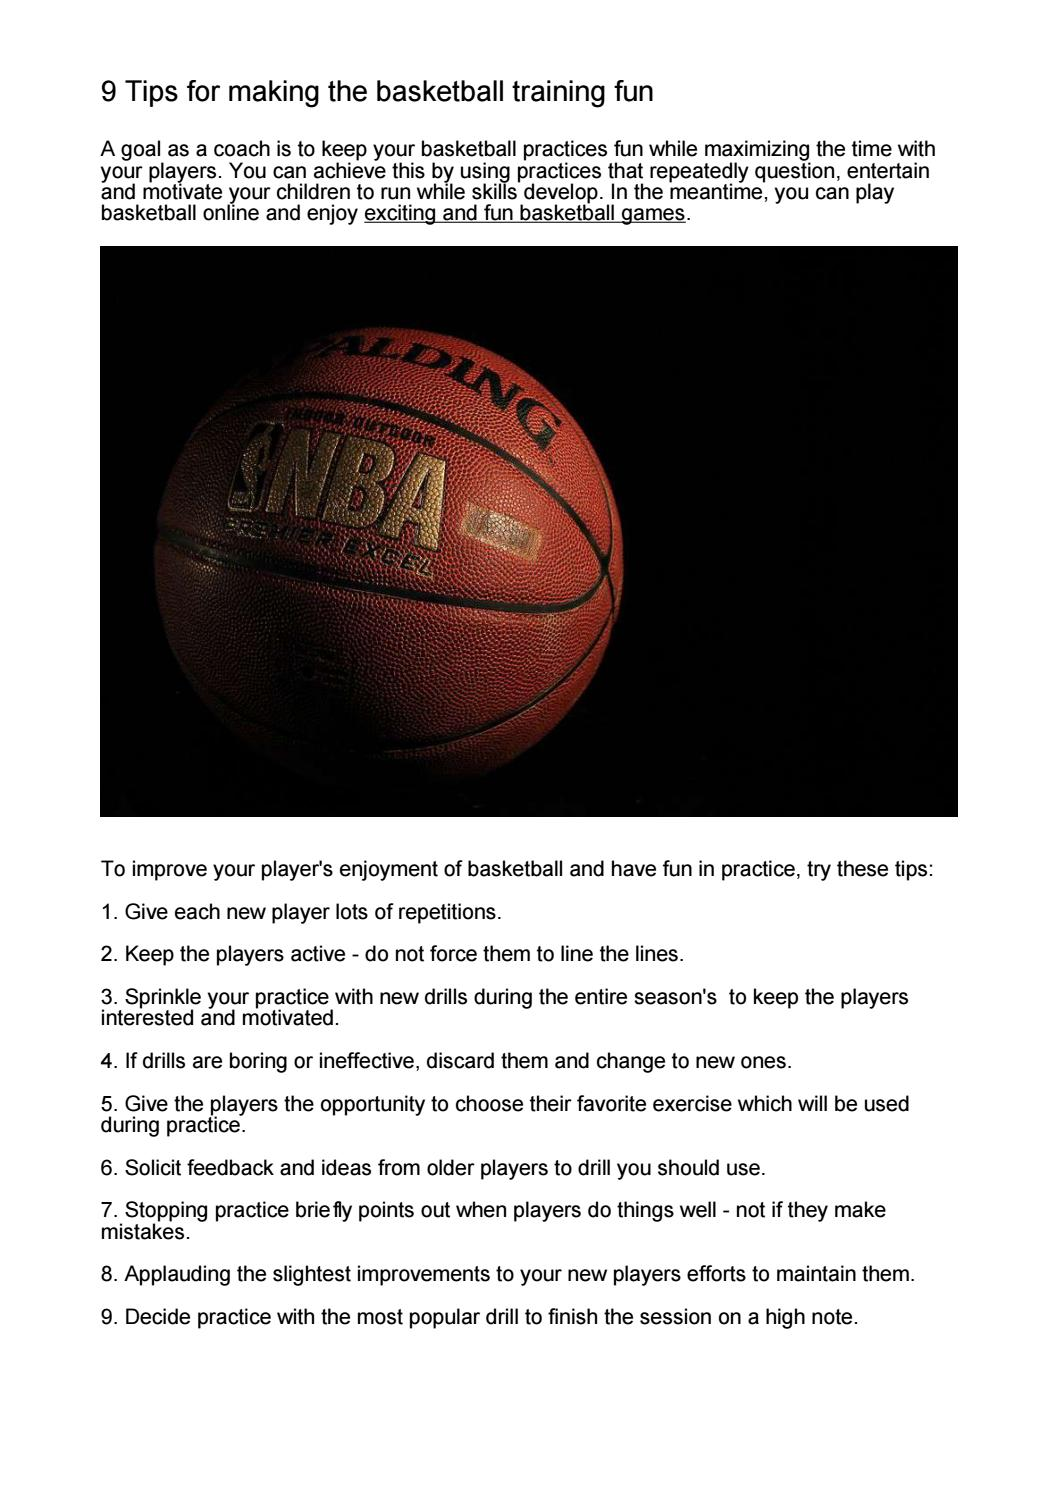 9 Tips For Fun Basketball Games Training By Kaukas Issuu